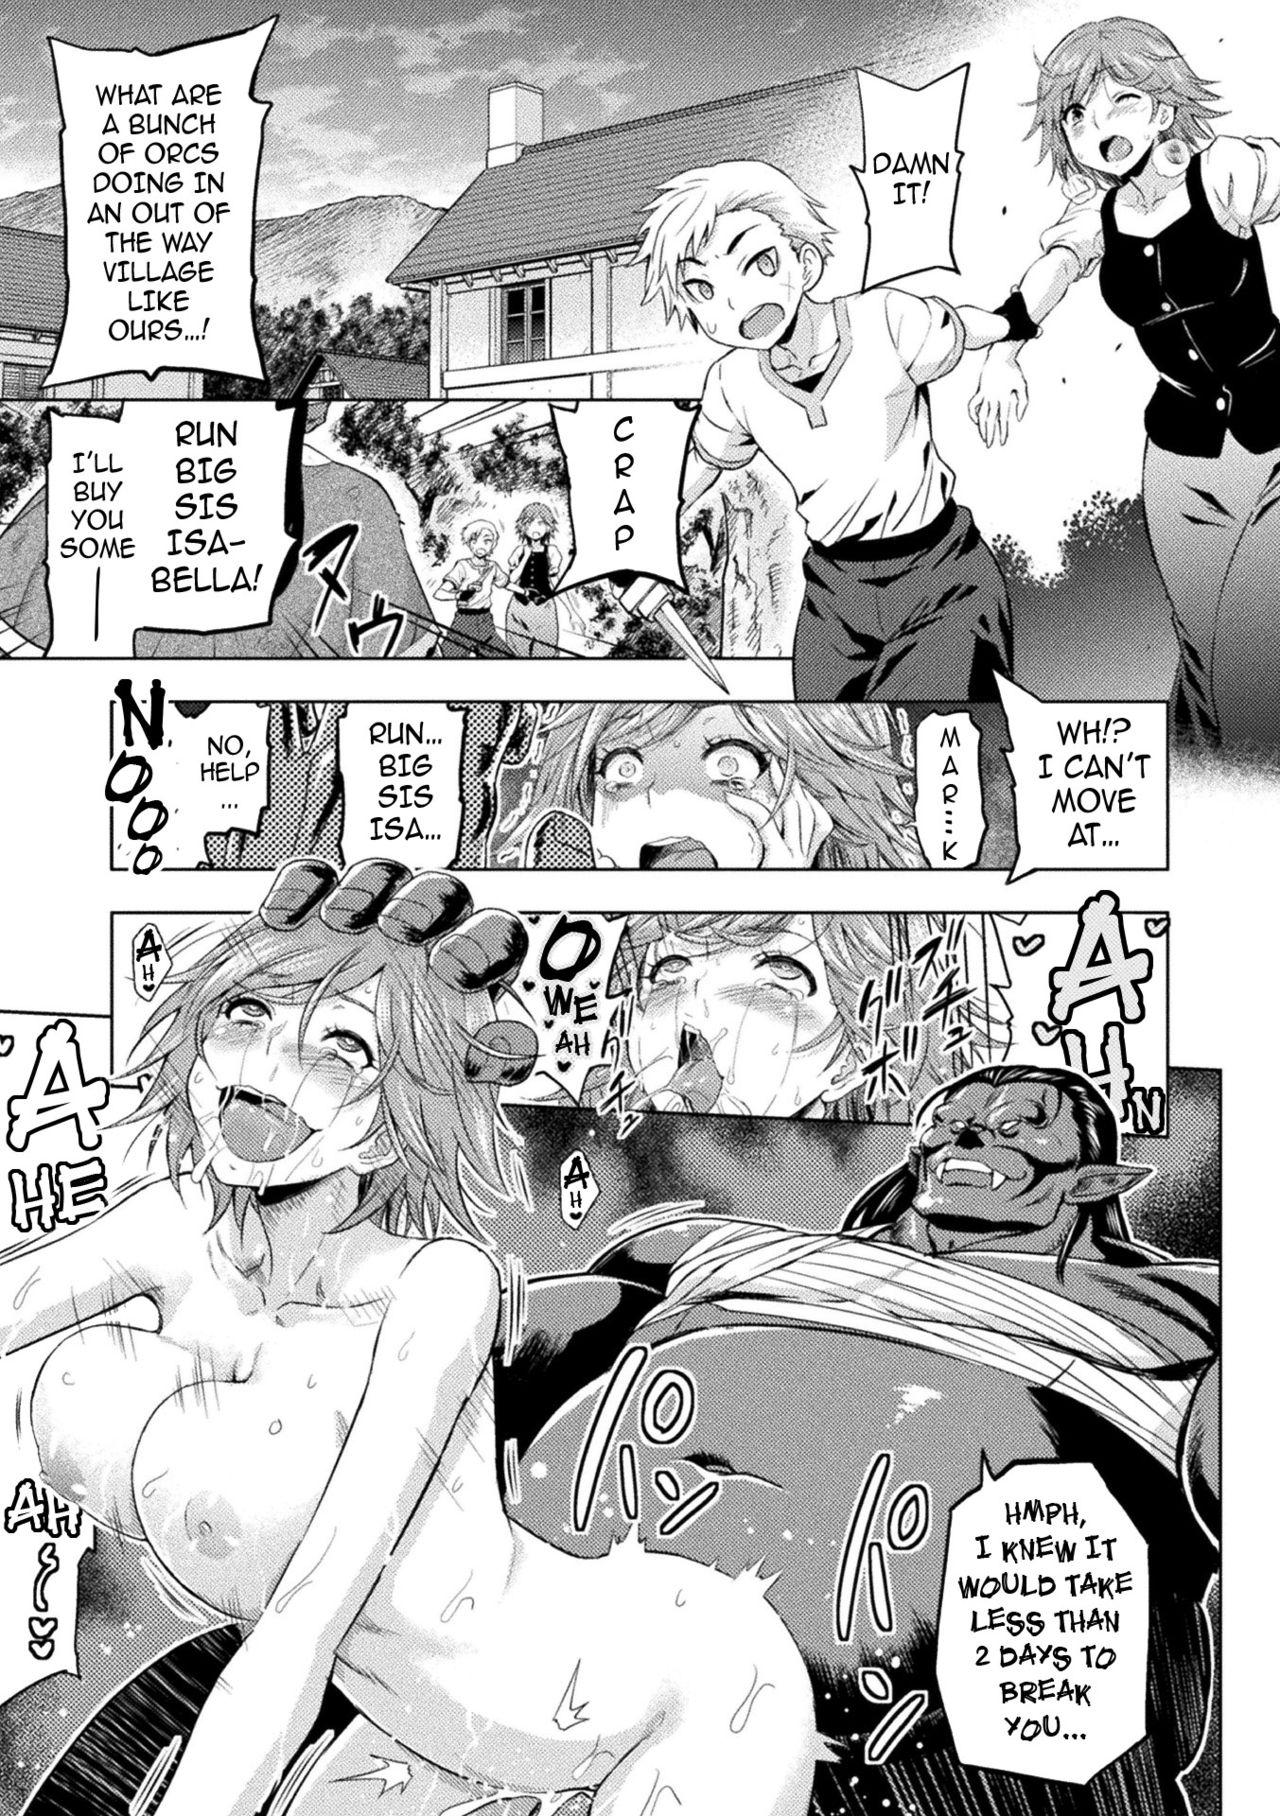 [Yamada Gogogo] Erona ~Orc no Inmon ni Okasareta Onna Kishi no Matsuro~ | Erona ~The Fall of a Beautiful Knight Cursed with the Lewd Mark of an Orc~ [English] {darknight} 153